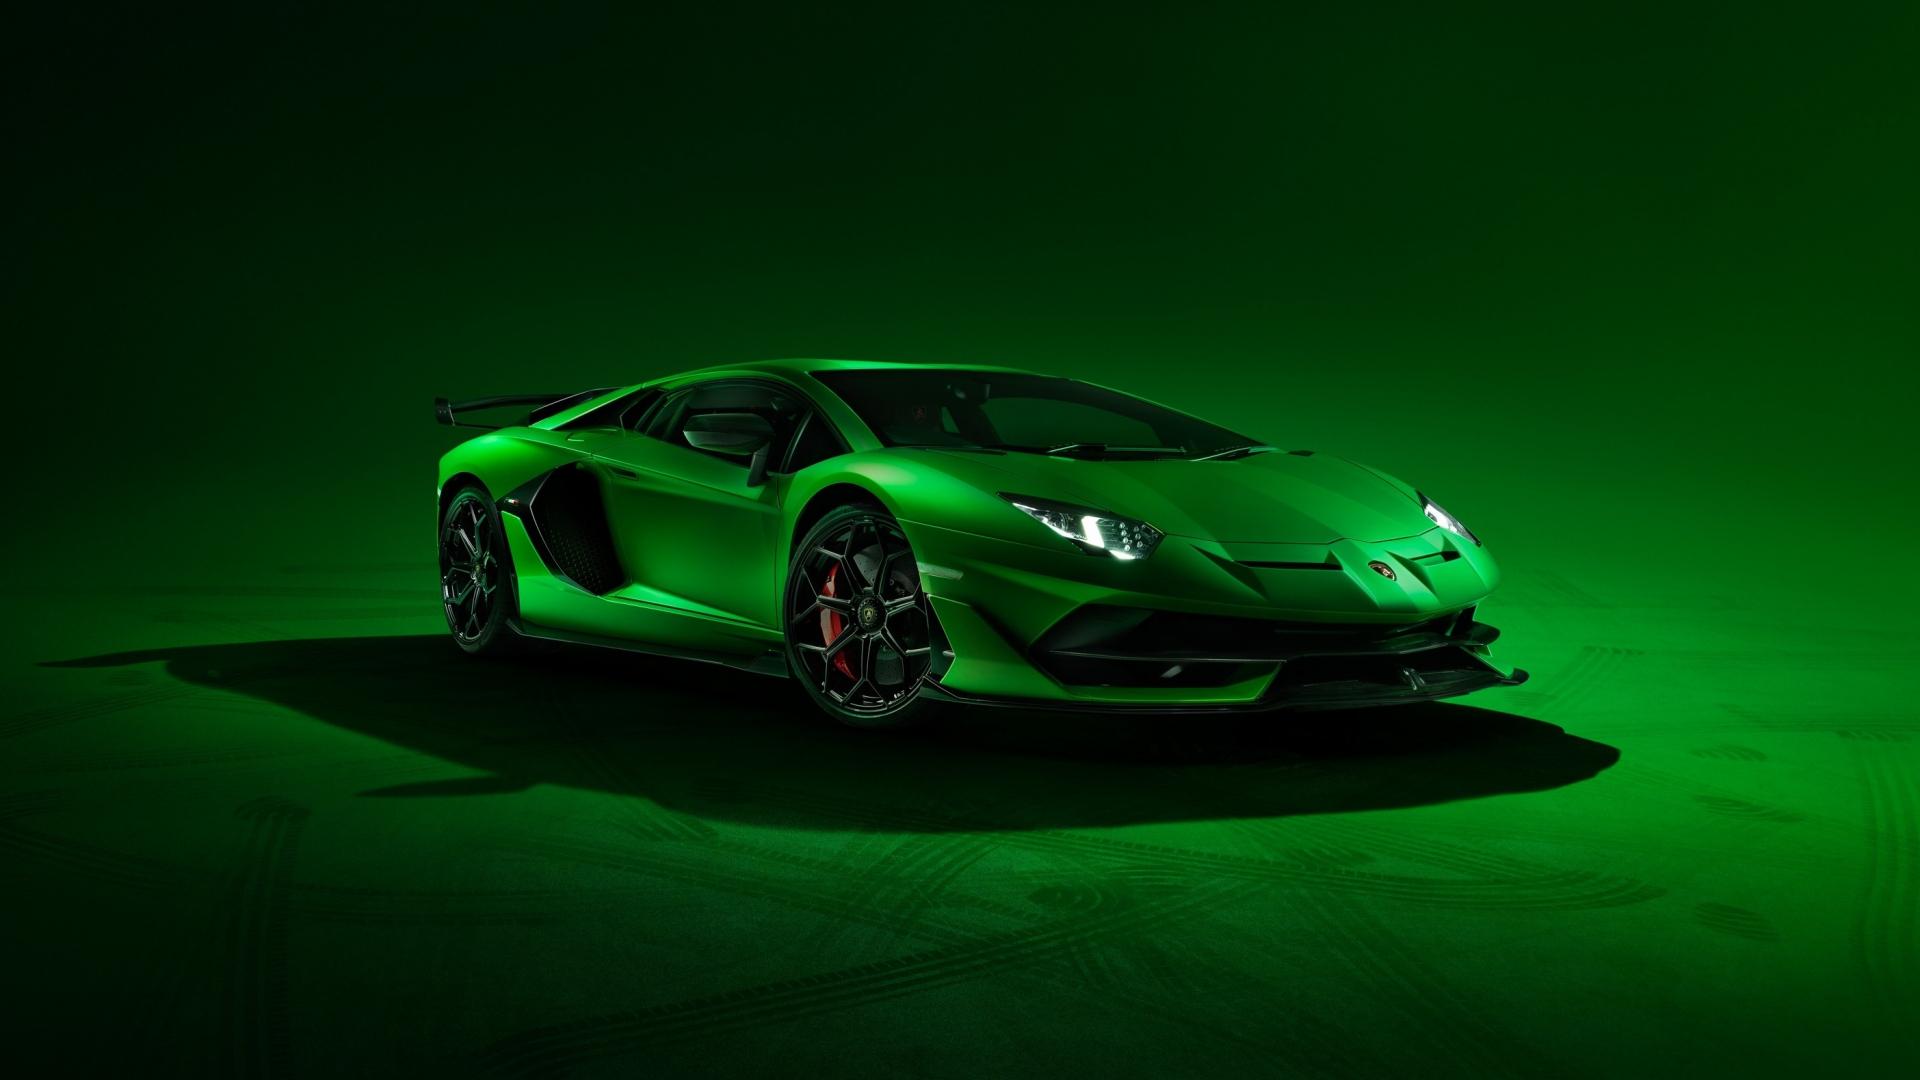 Download 1920x1080 Wallpaper Lamborghini Aventador Svj Sports Car